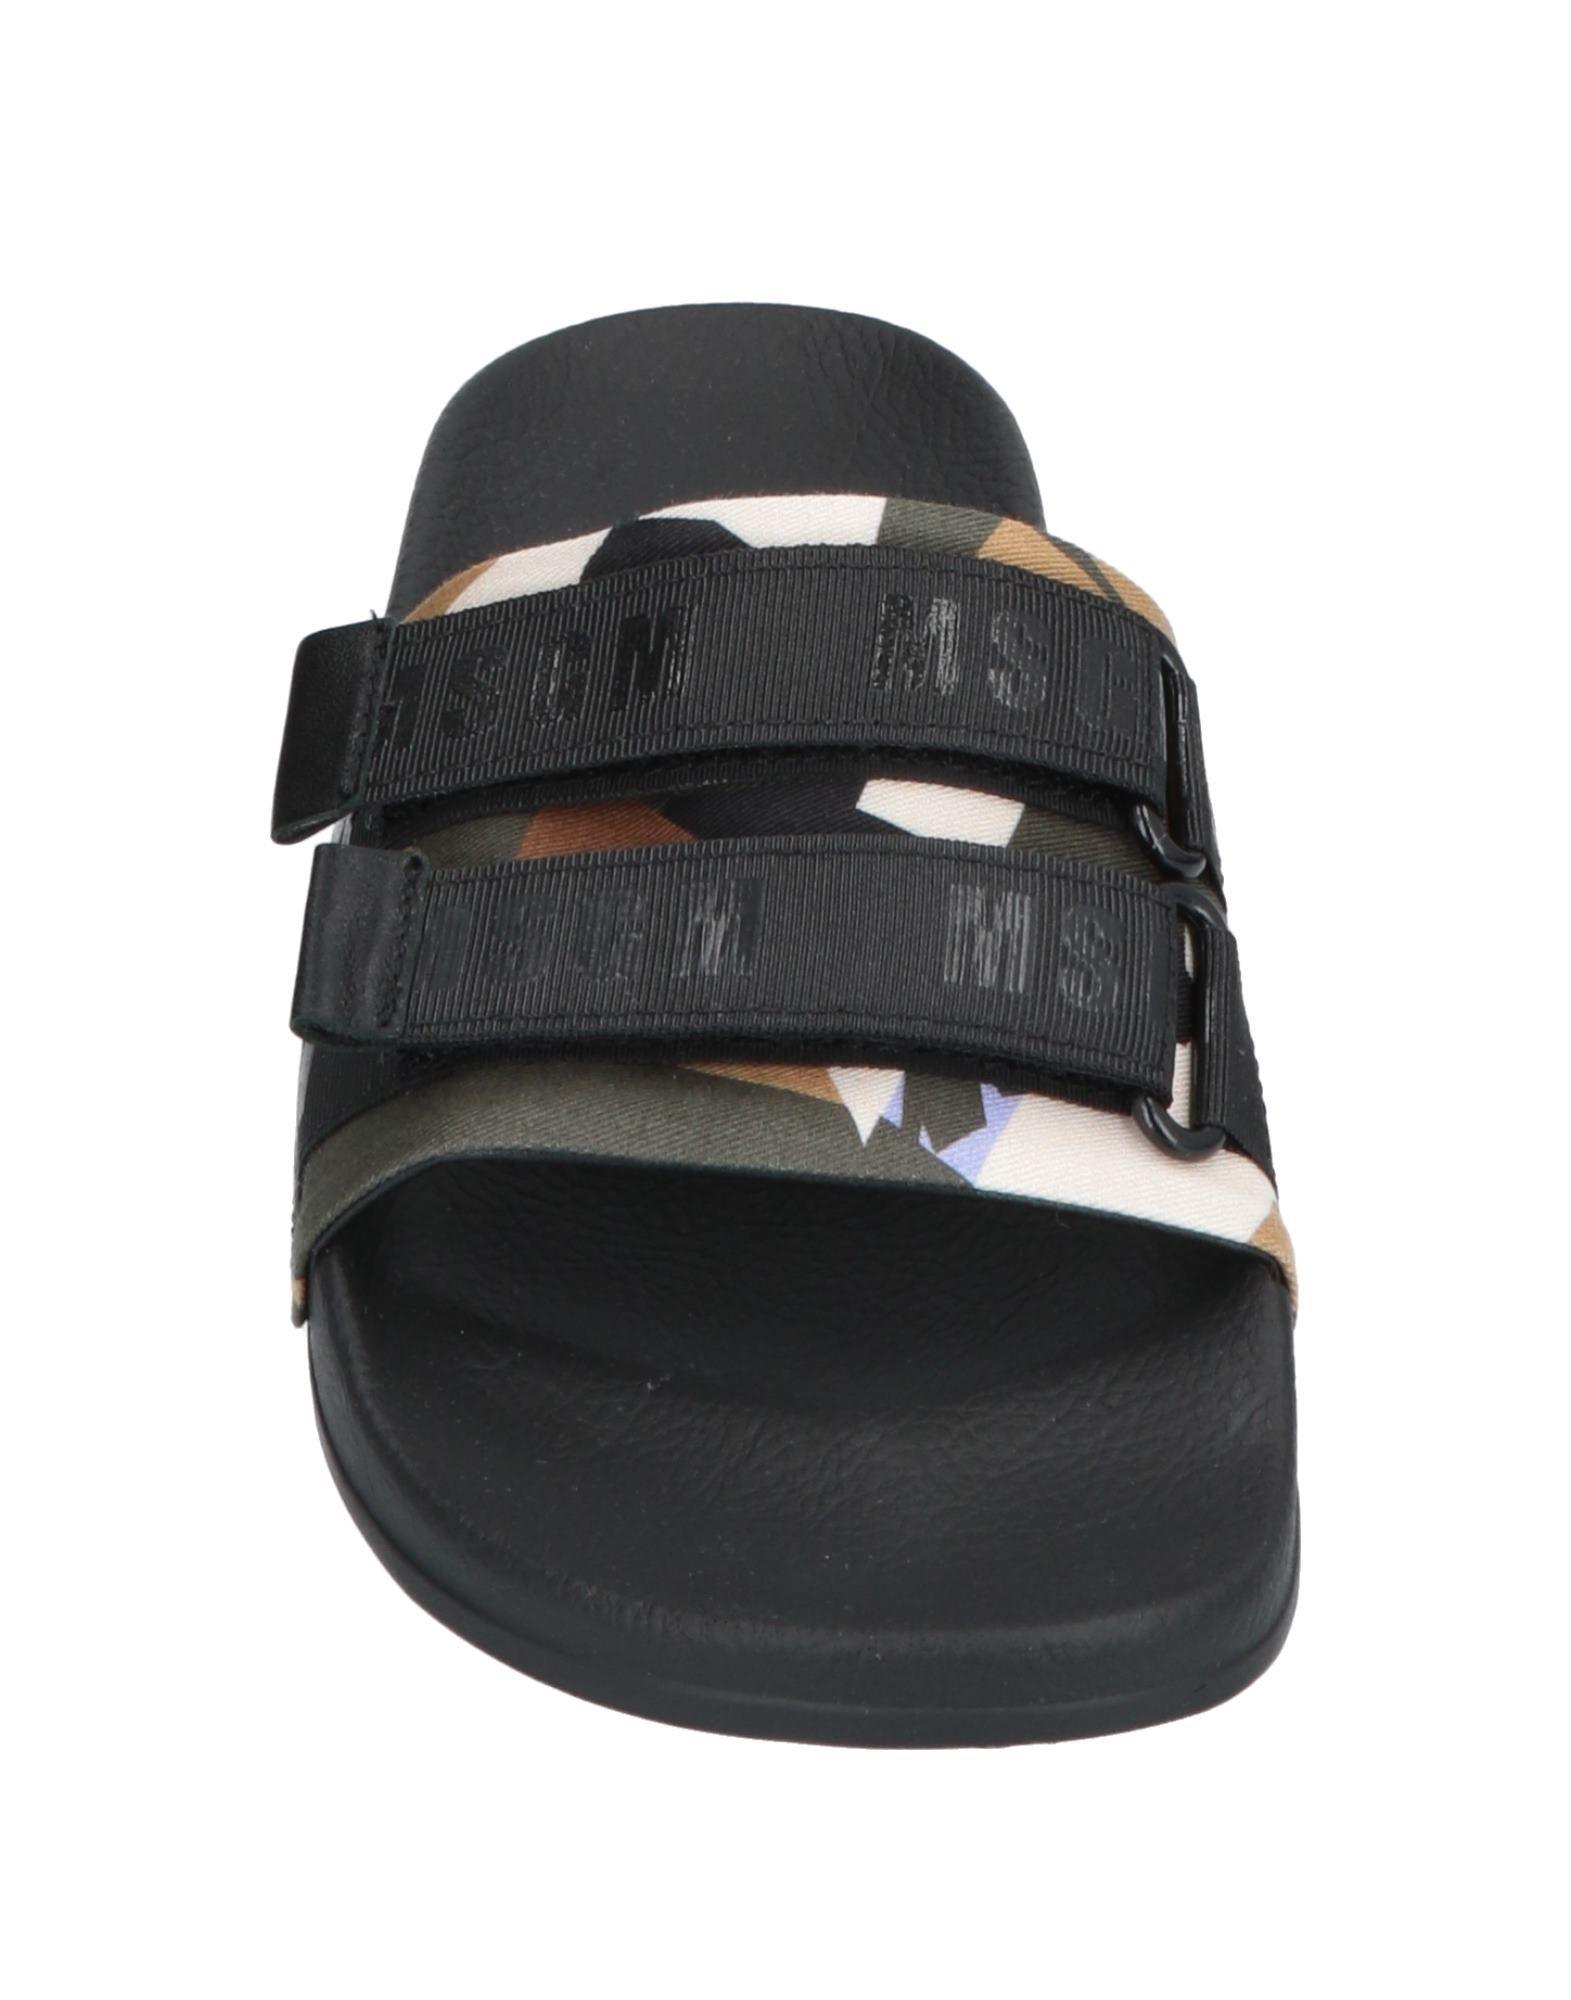 2bae5bad3 Msgm Sandals - Men Msgm Sandals online on YOOX United States - 11623850AT